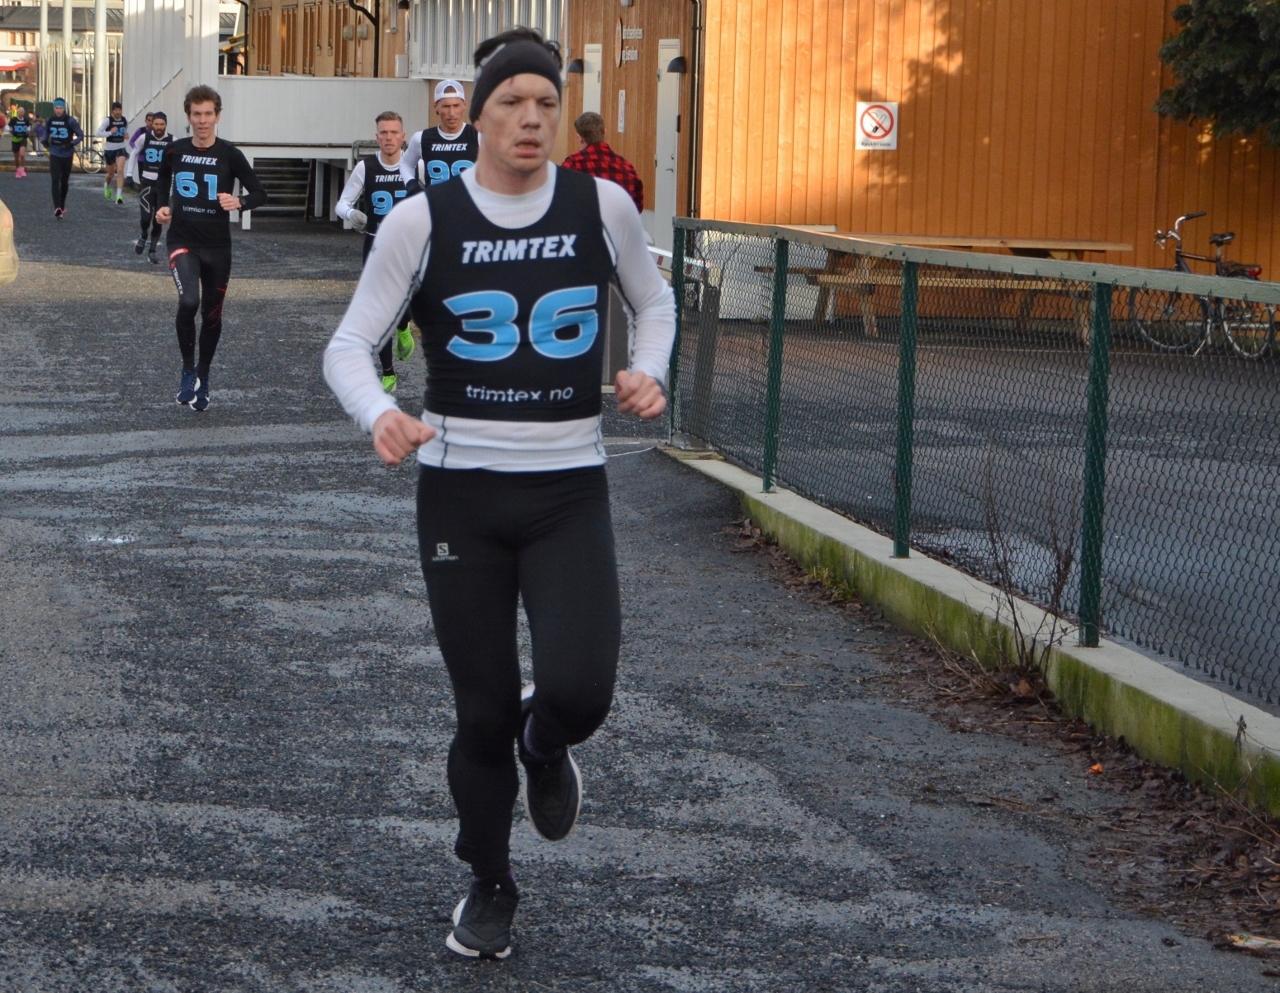 Magnus_Finset_Kristiansand_løp2 (1280x993).jpg